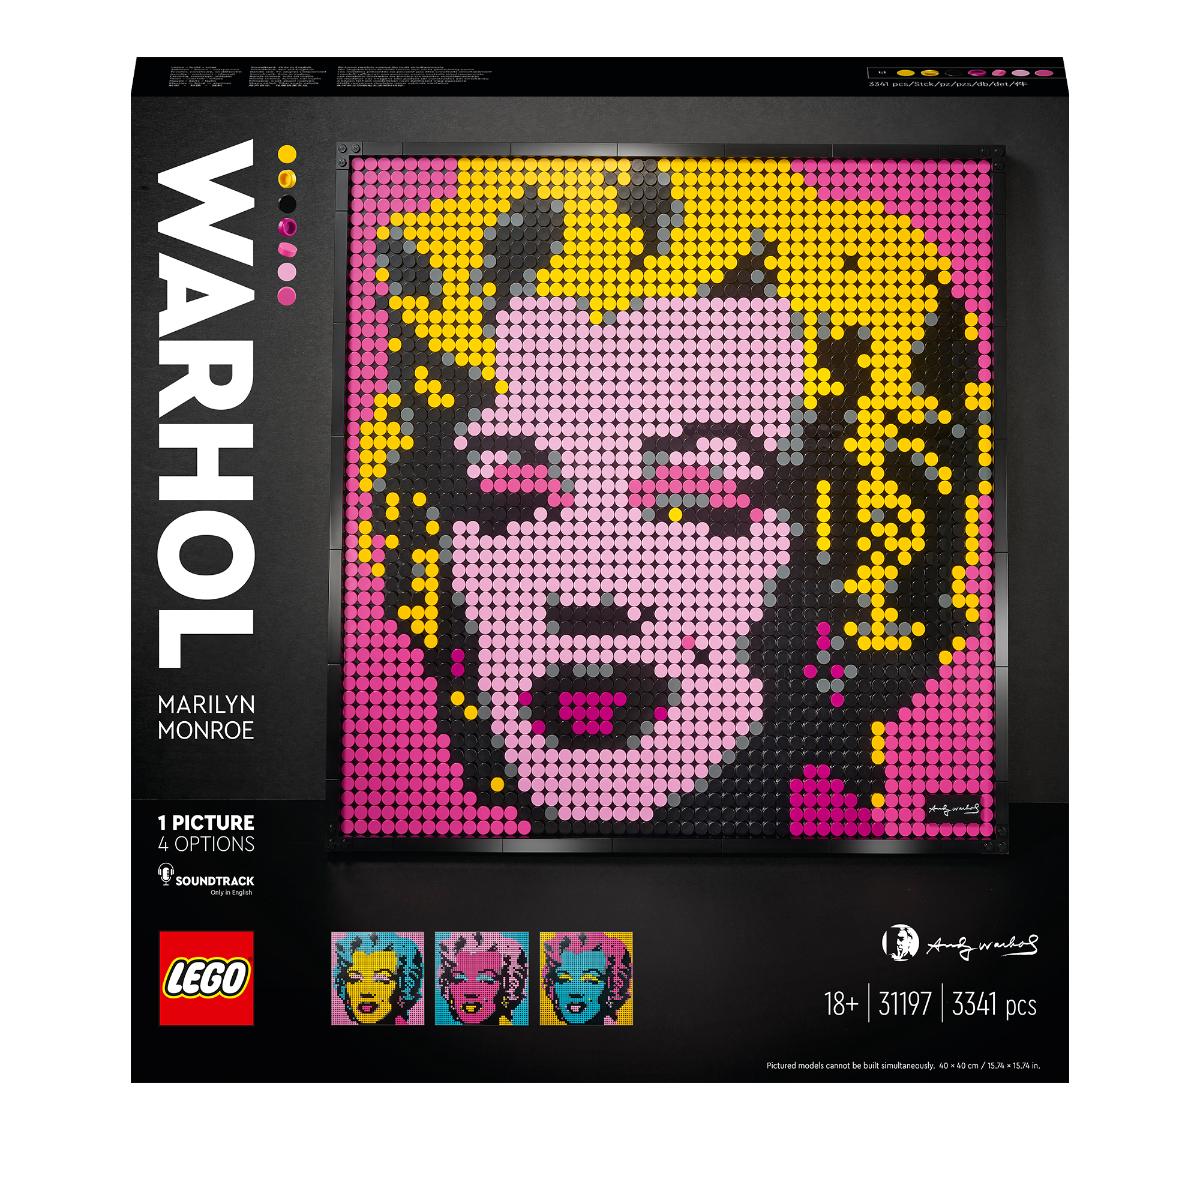 LEGO Art 31197 Andy Warhol's Marilyn Monroe - £75 @ Starlings Toys